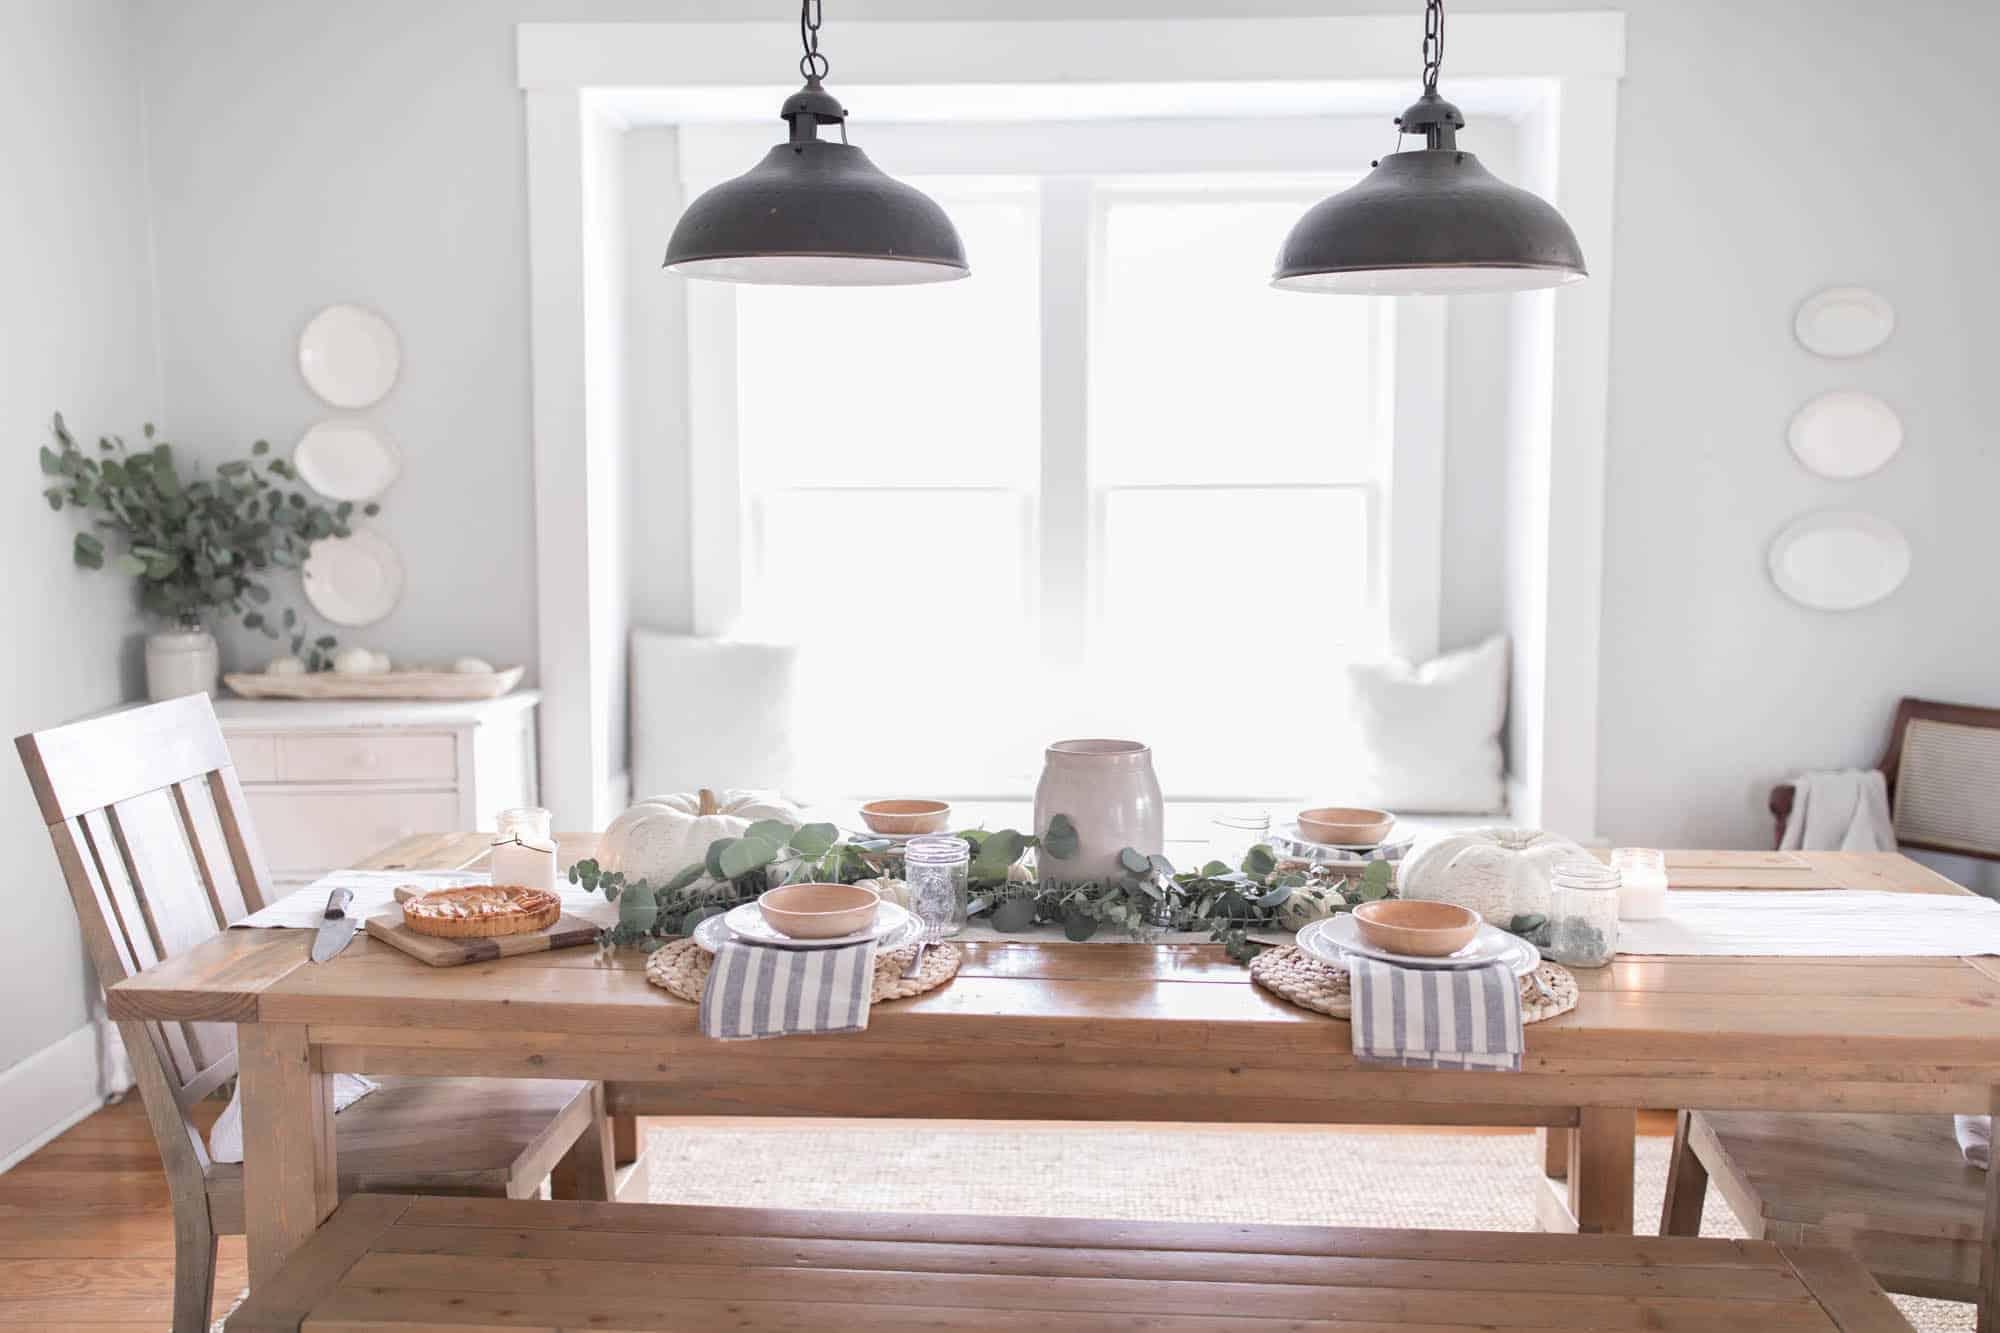 Farmhouse Thanksgiving Tablescape with pumpkins and eucalyptus